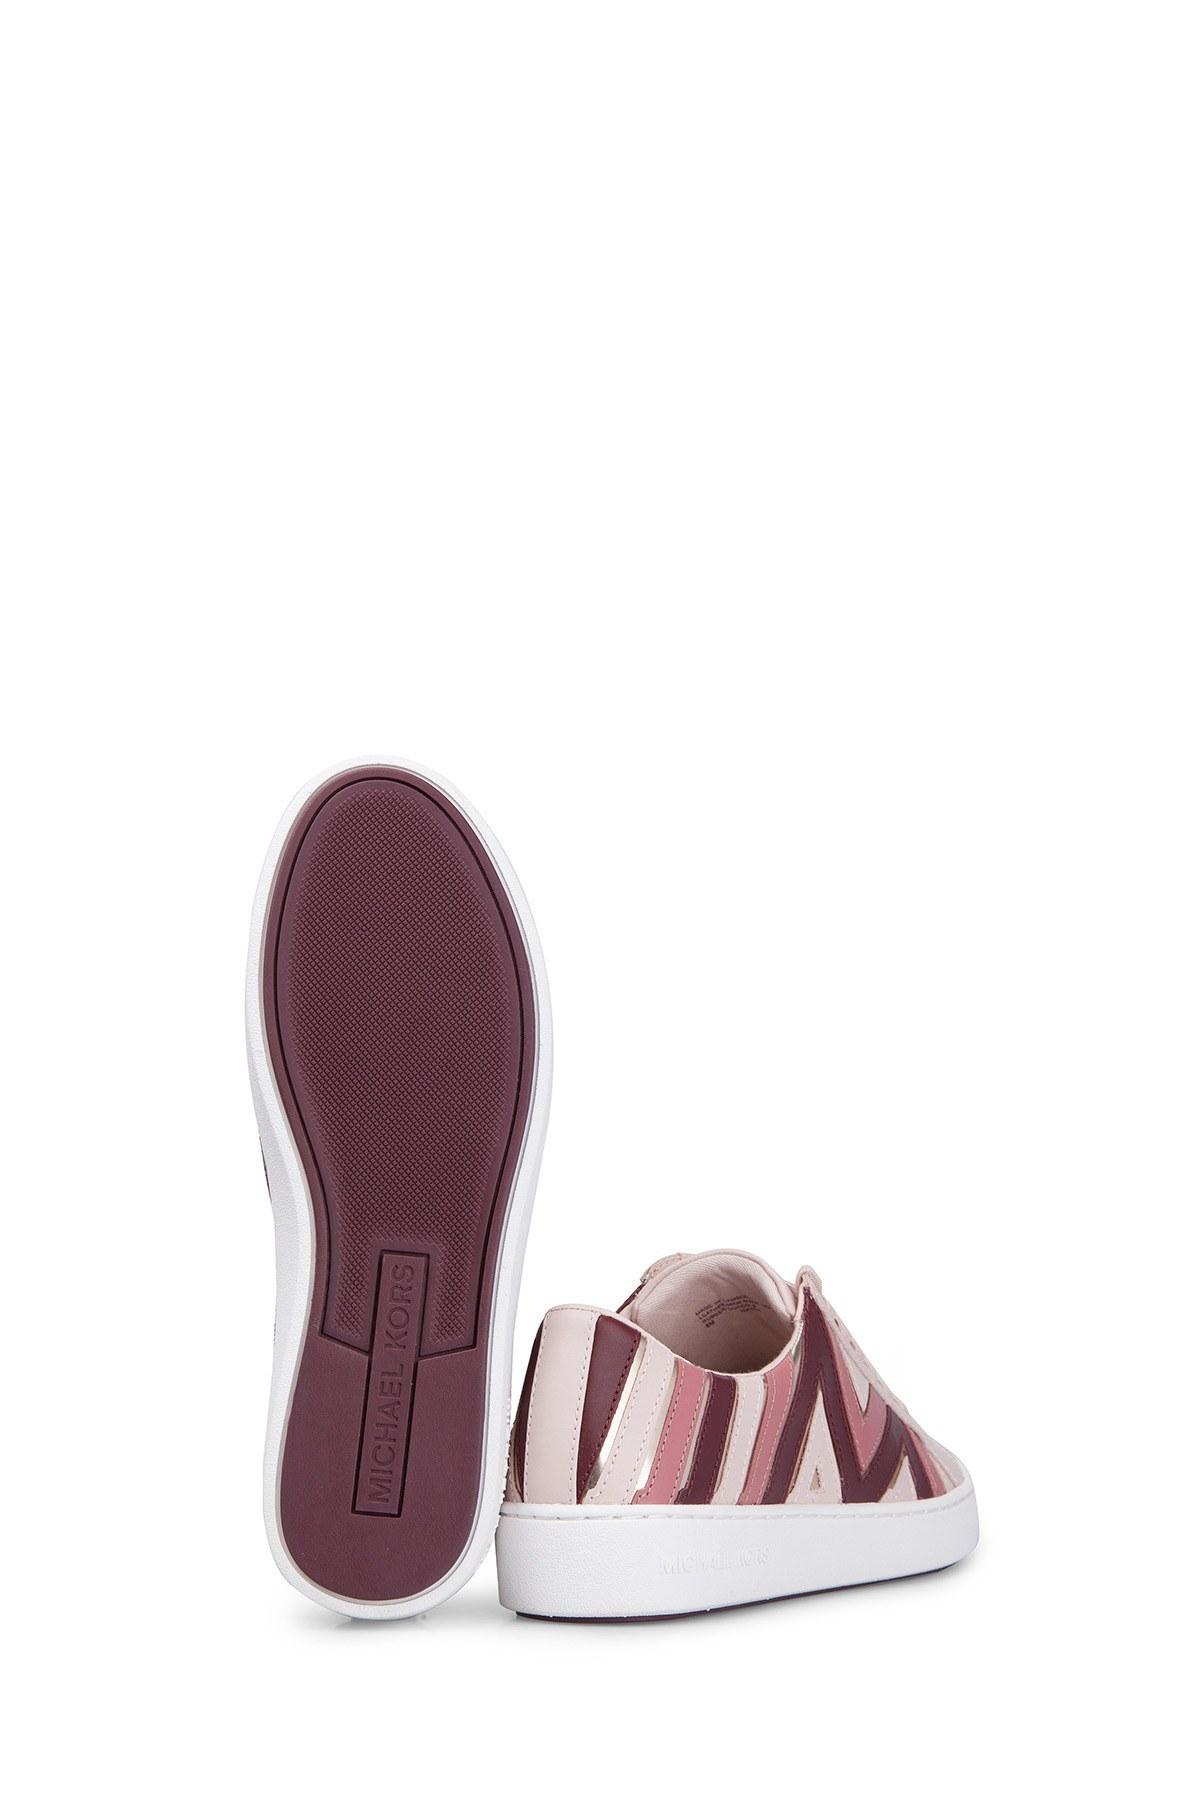 MICHAEL KORS Kadın Ayakkabı 43R9WHFS3L 187 PUDRA